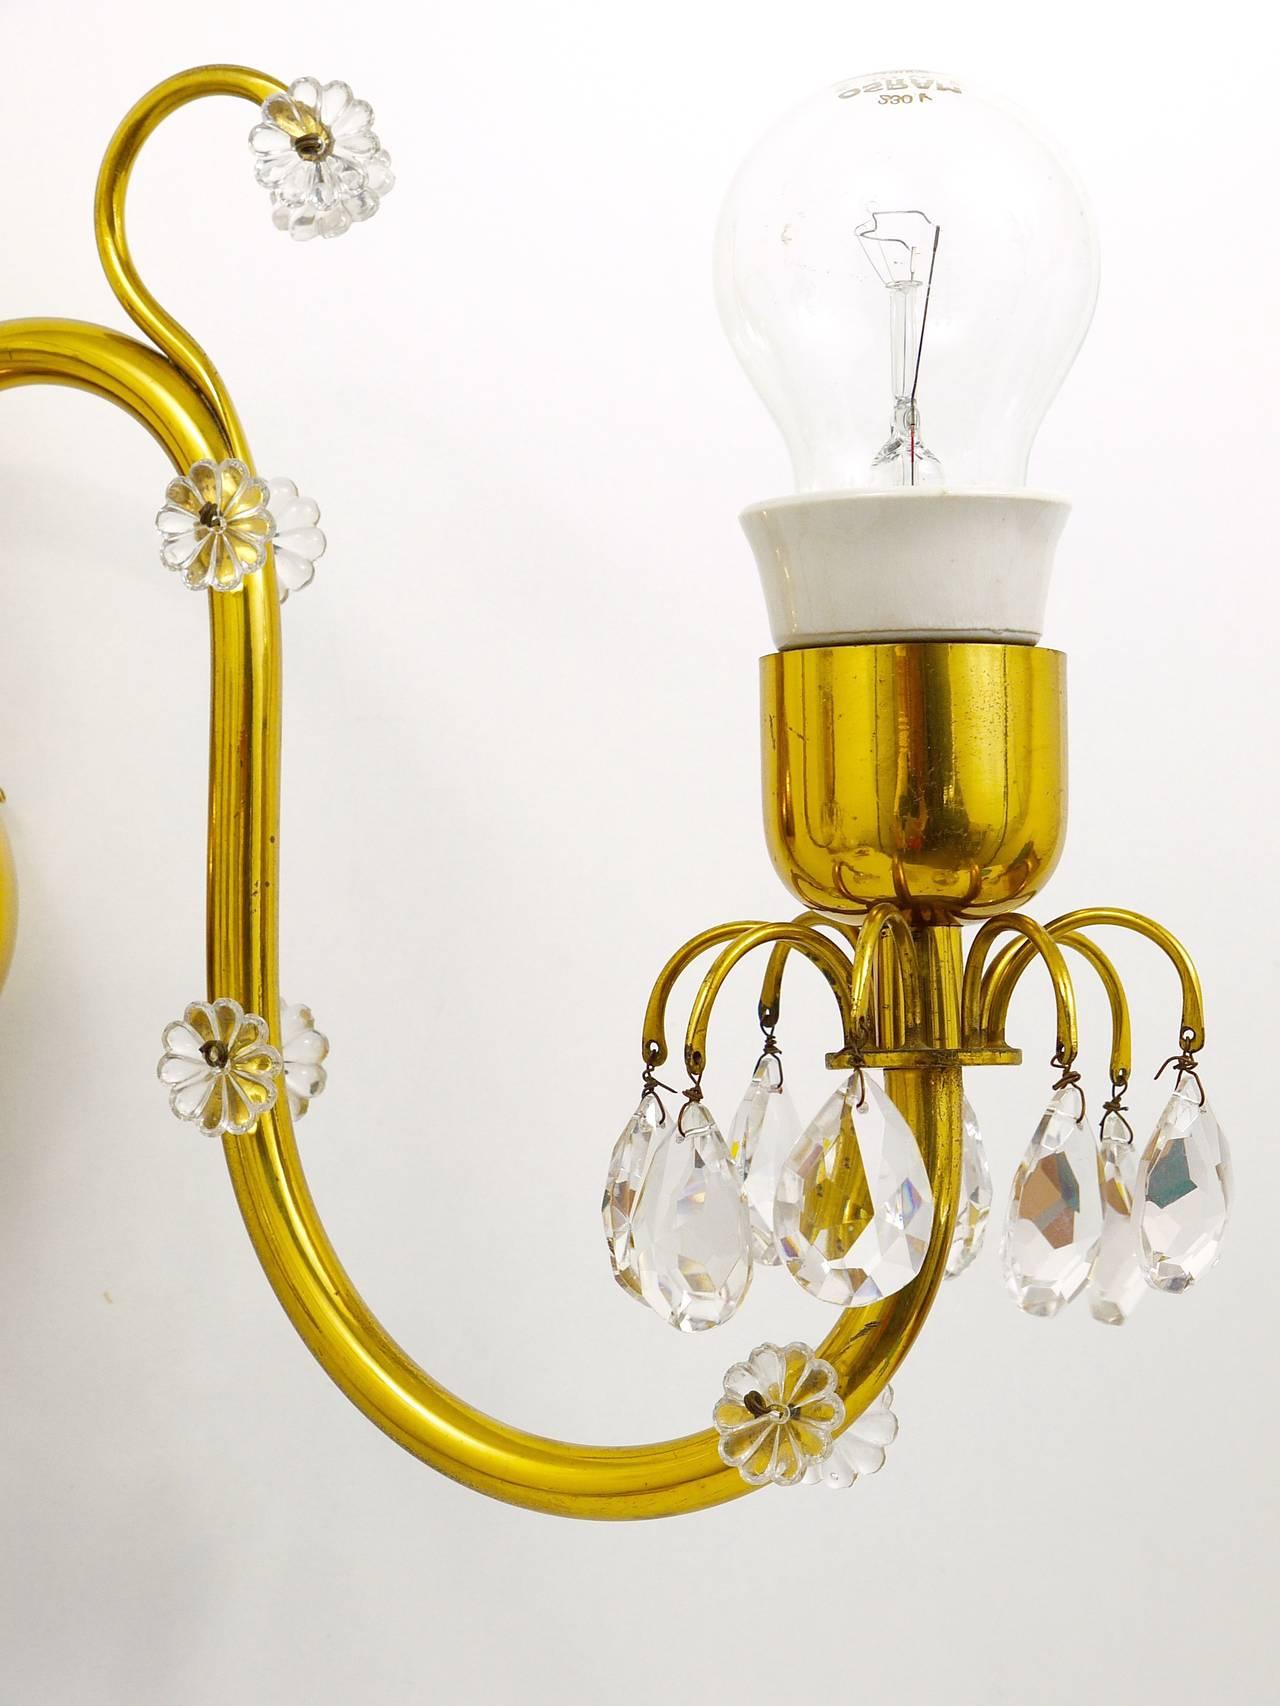 Austrian Beautiful Huge Lobmeyr Vienna Brass Crystal Sconce Wall Light, Austria, 1950s For Sale